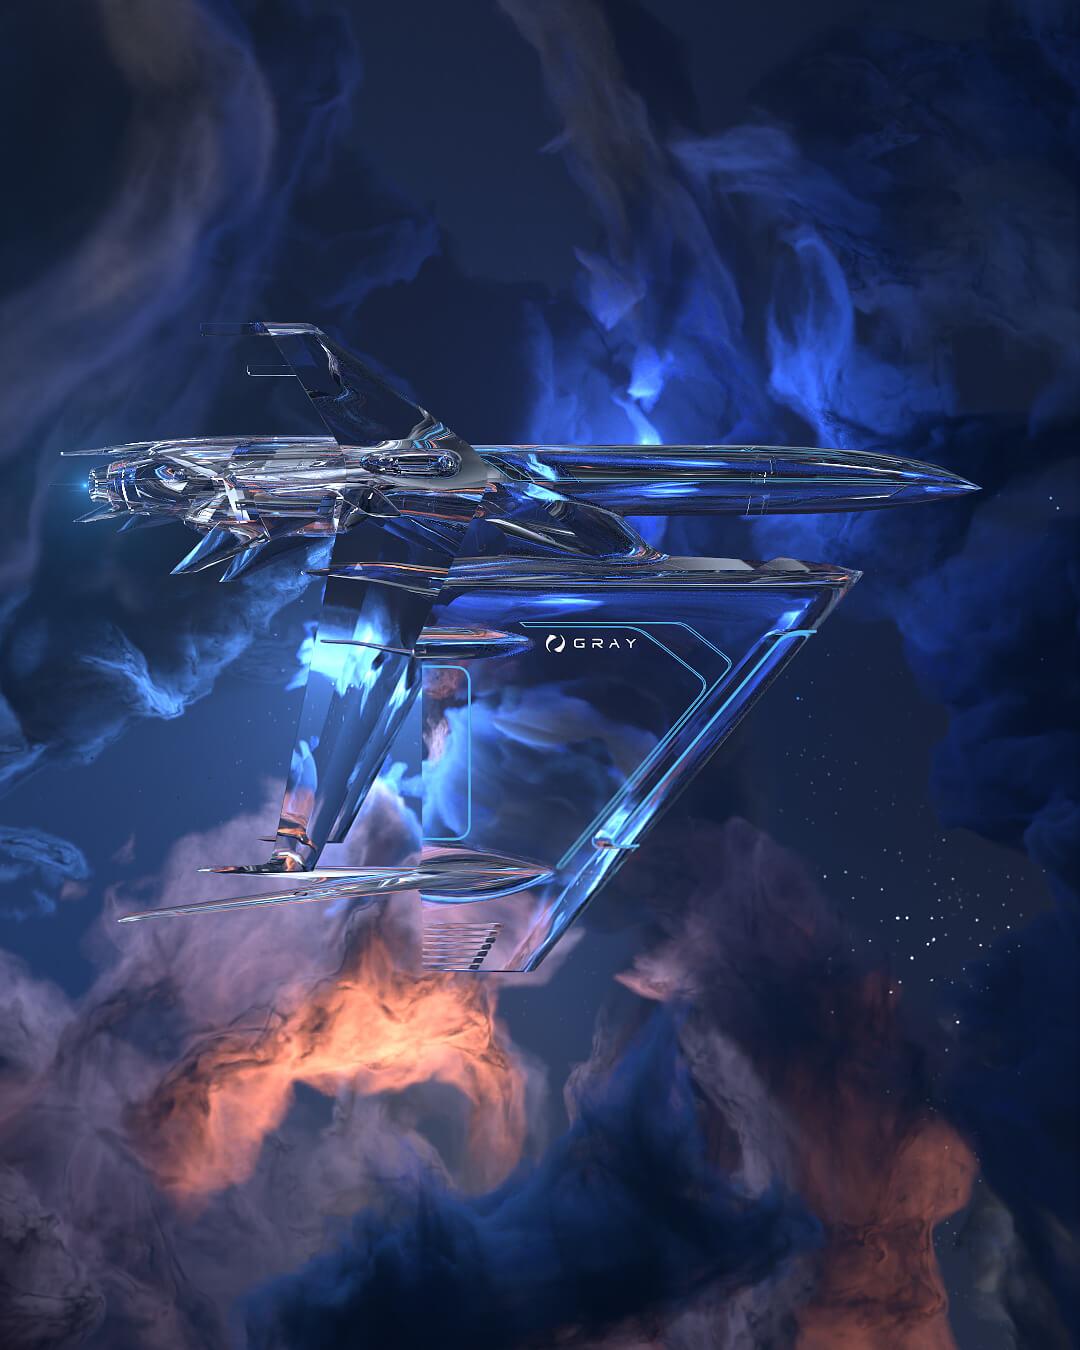 graycraft1-6 crystal spaceship NFT animation